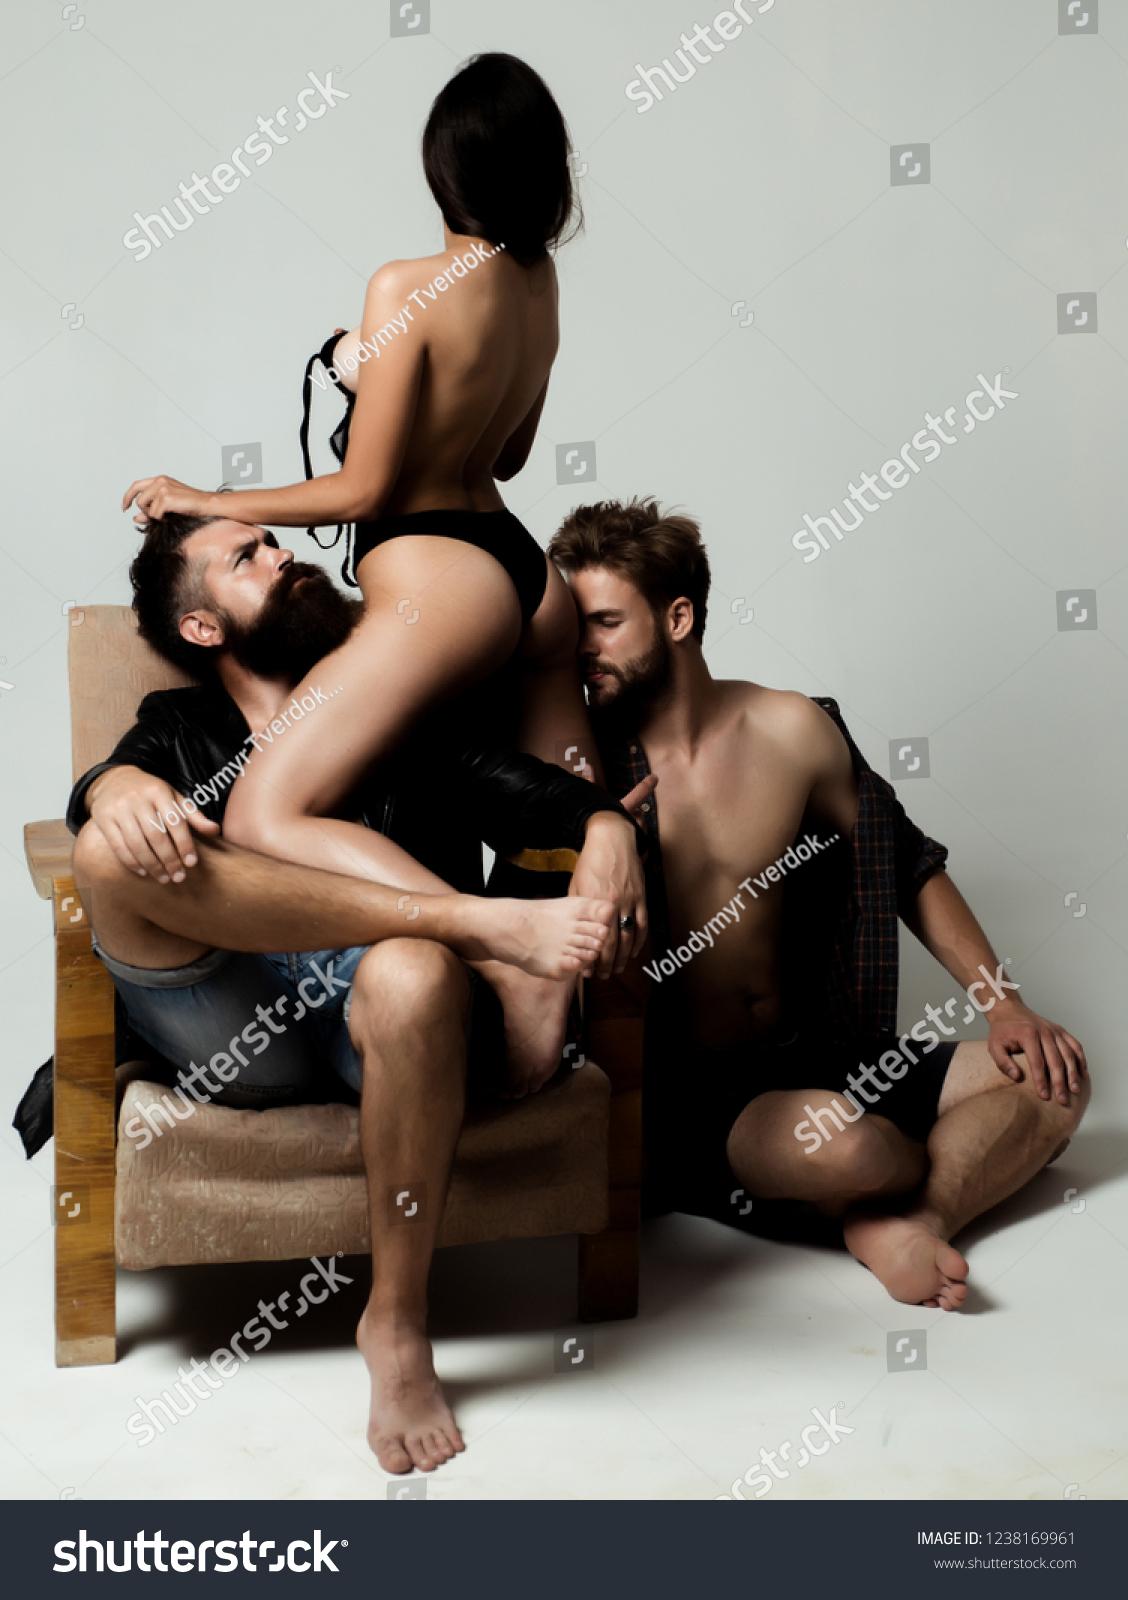 Sensual Threesome